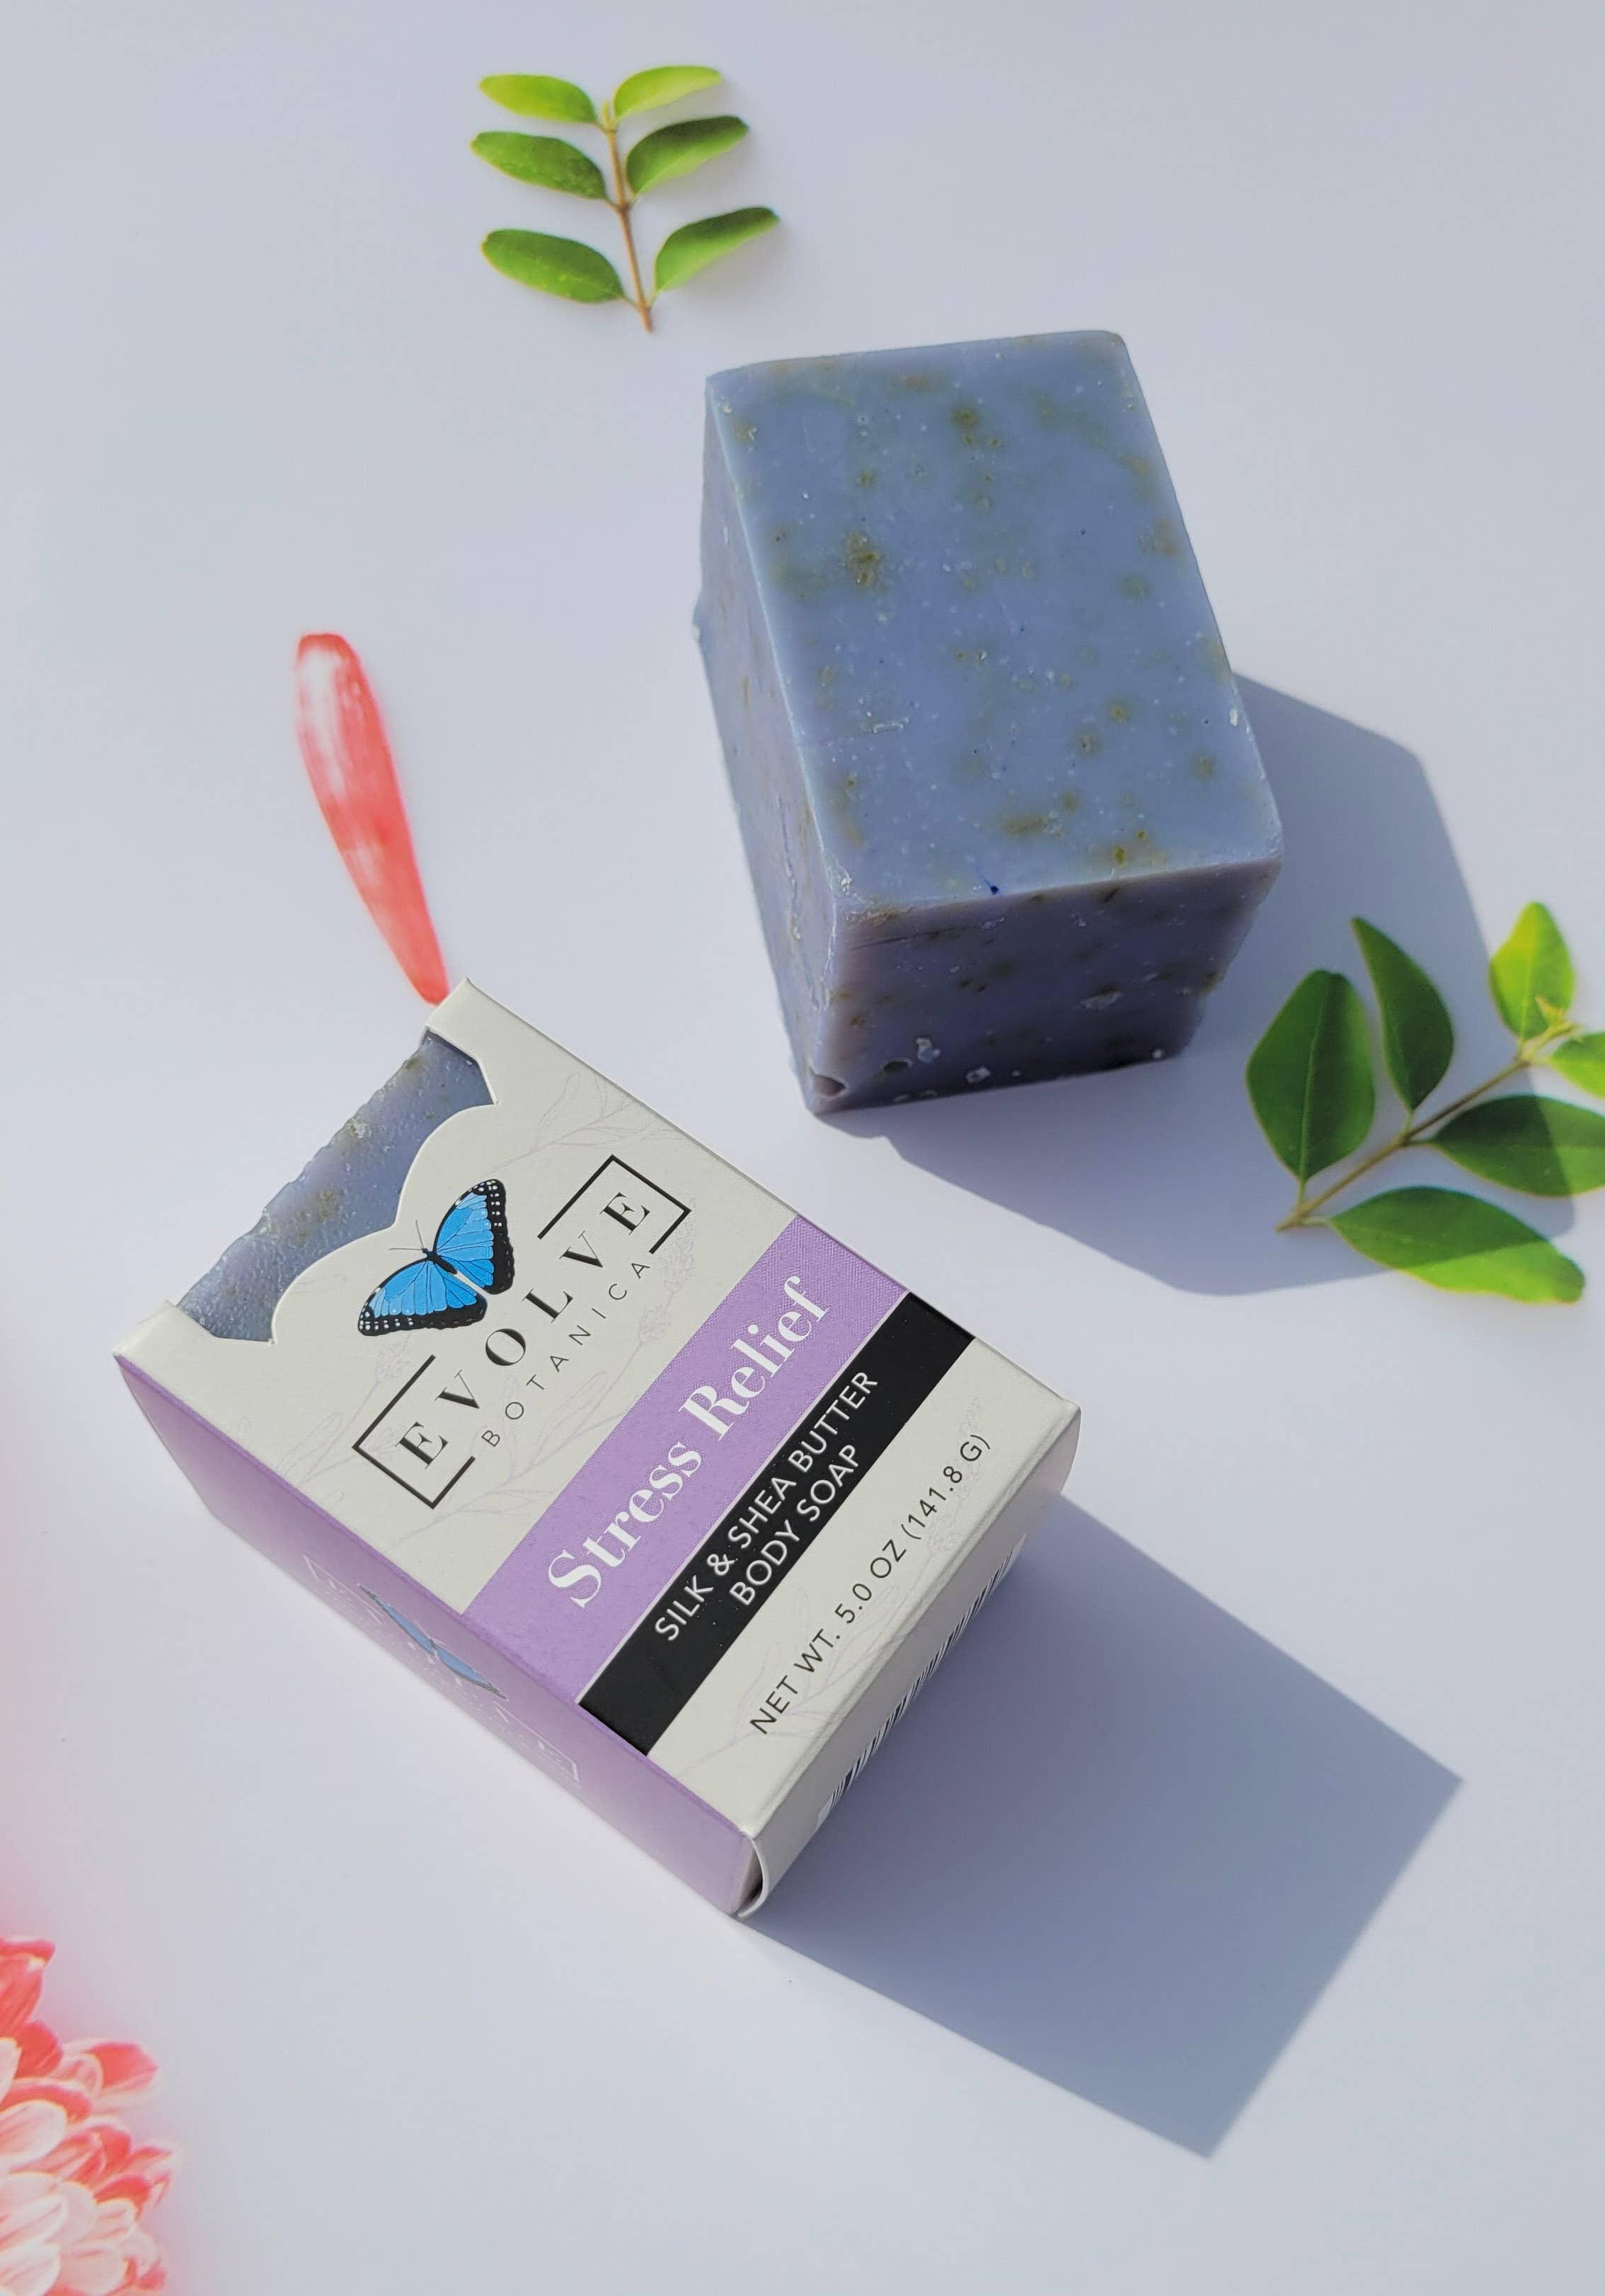 Evolve - Specialty Soap - Stress Relief Silk | Trada Marketplace